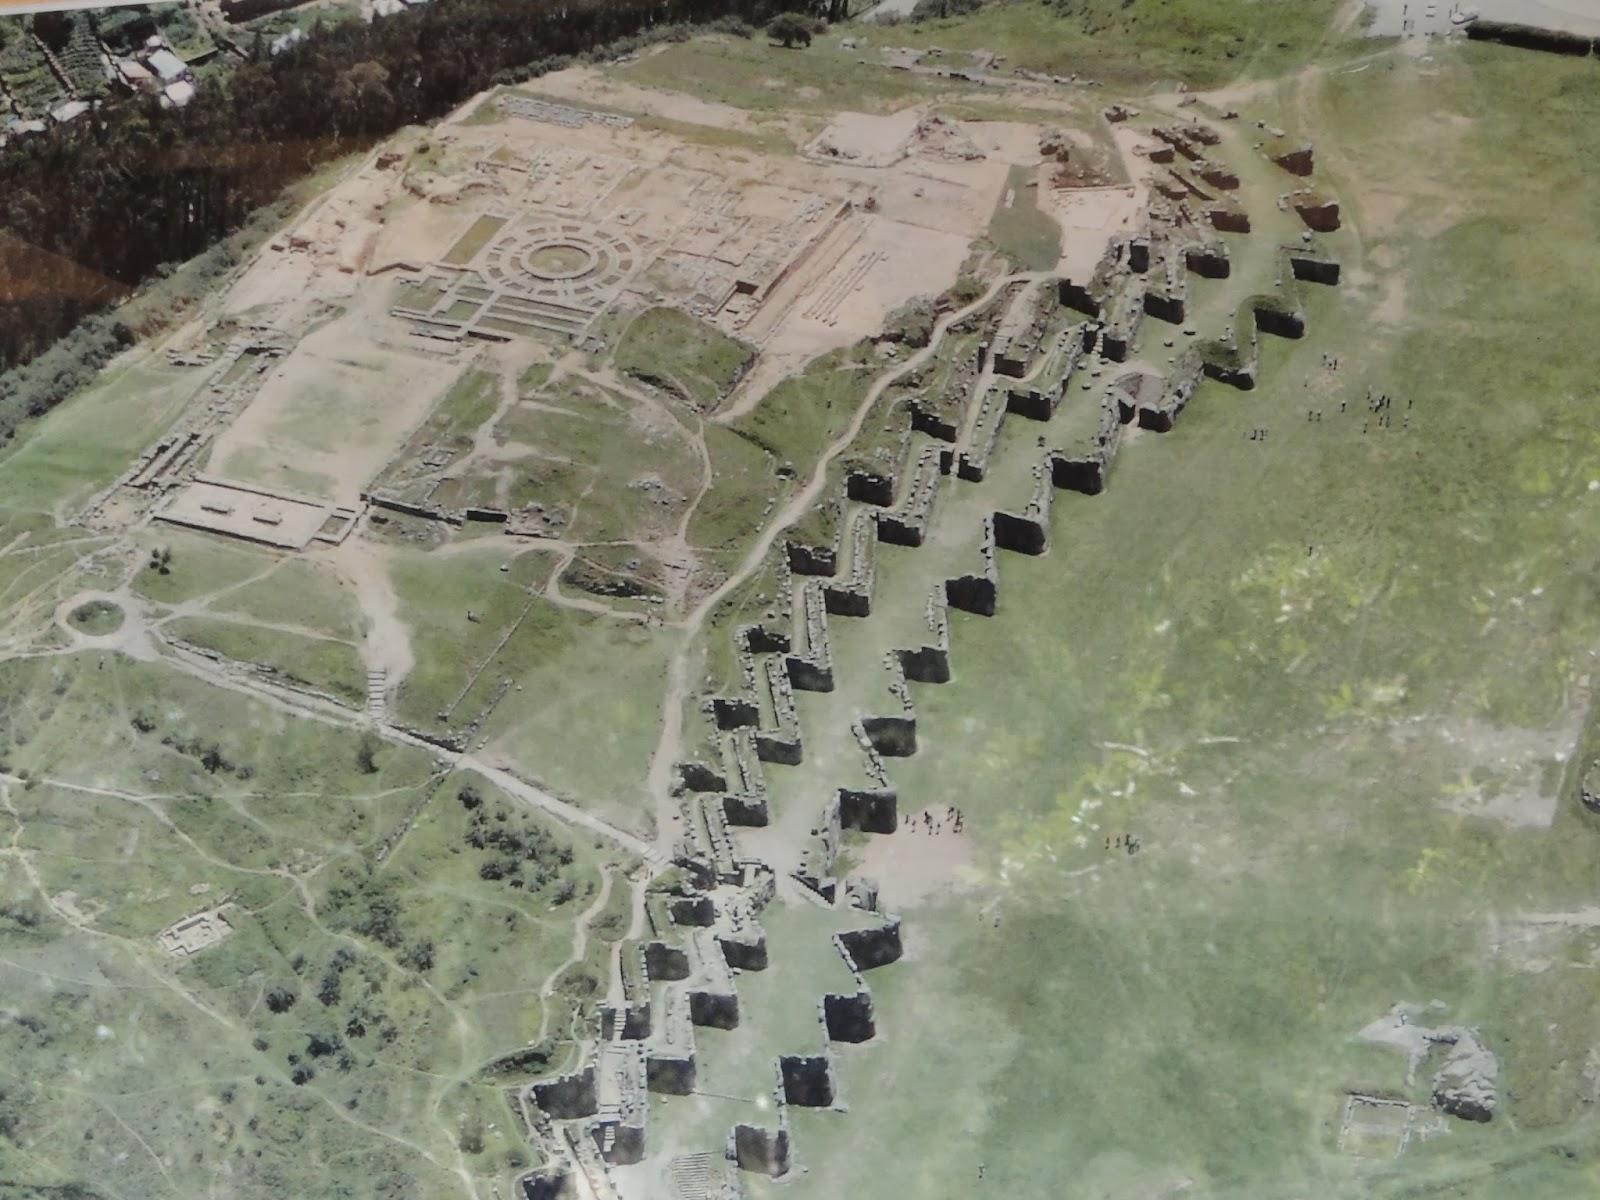 SACSAYHUAMÁN, Q'ENQO, PUKAPUKARA, TAMBOMACHAY, SANTUÁRIO COCHAHUASI, PISAC - Cusco, Peru